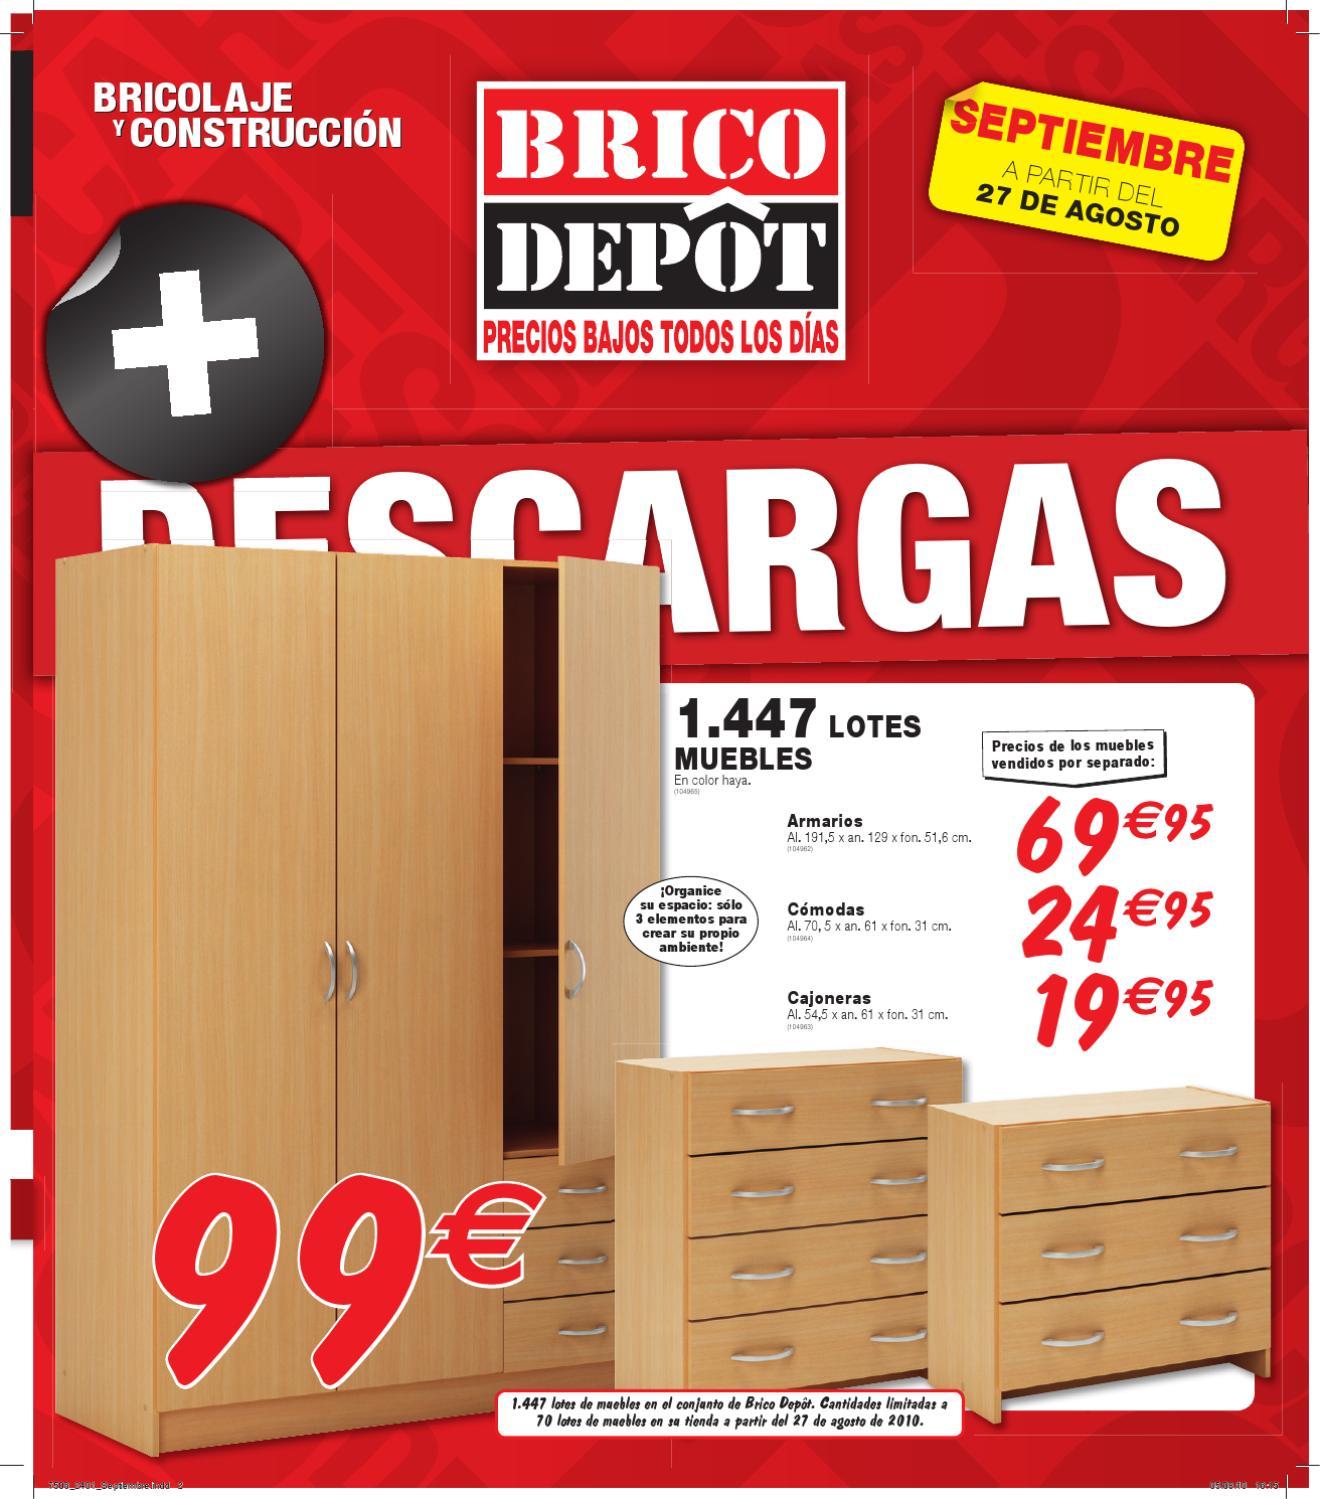 Armarios en brico depot excellent good amazing oferta aire bricodepot with oferta aire - Armario resina bricodepot ...